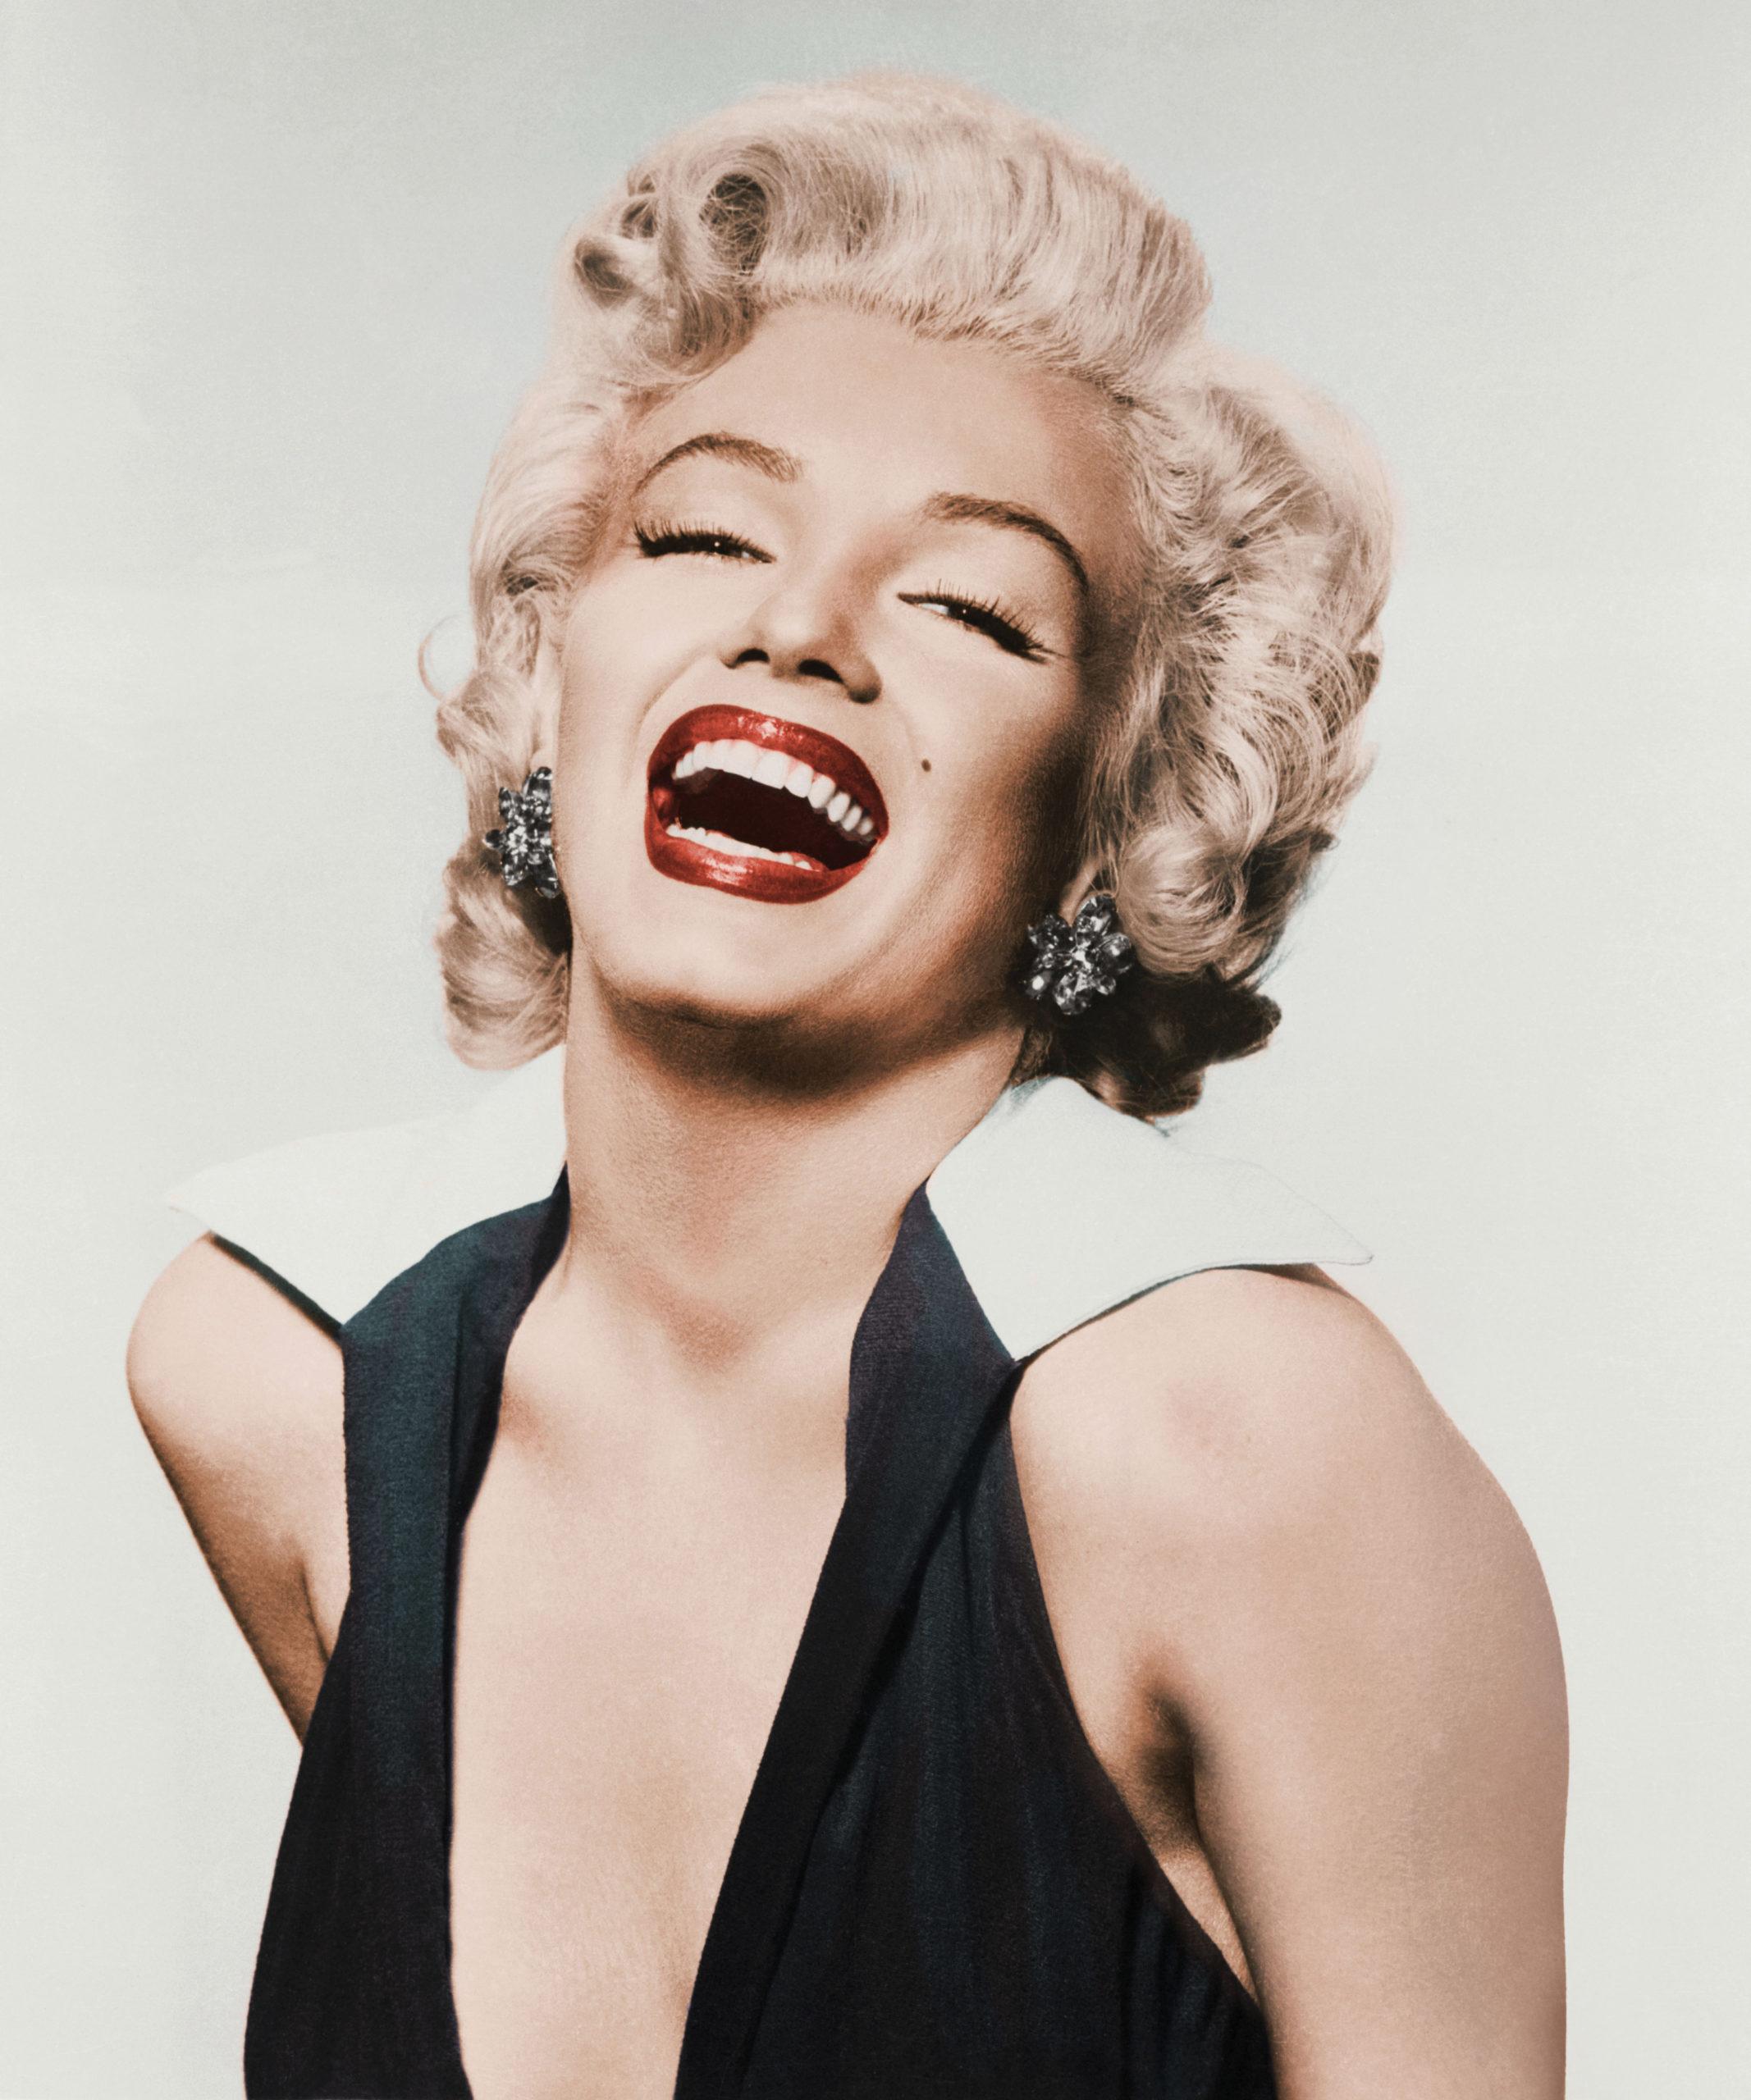 Marilyn-monroe_CMYK